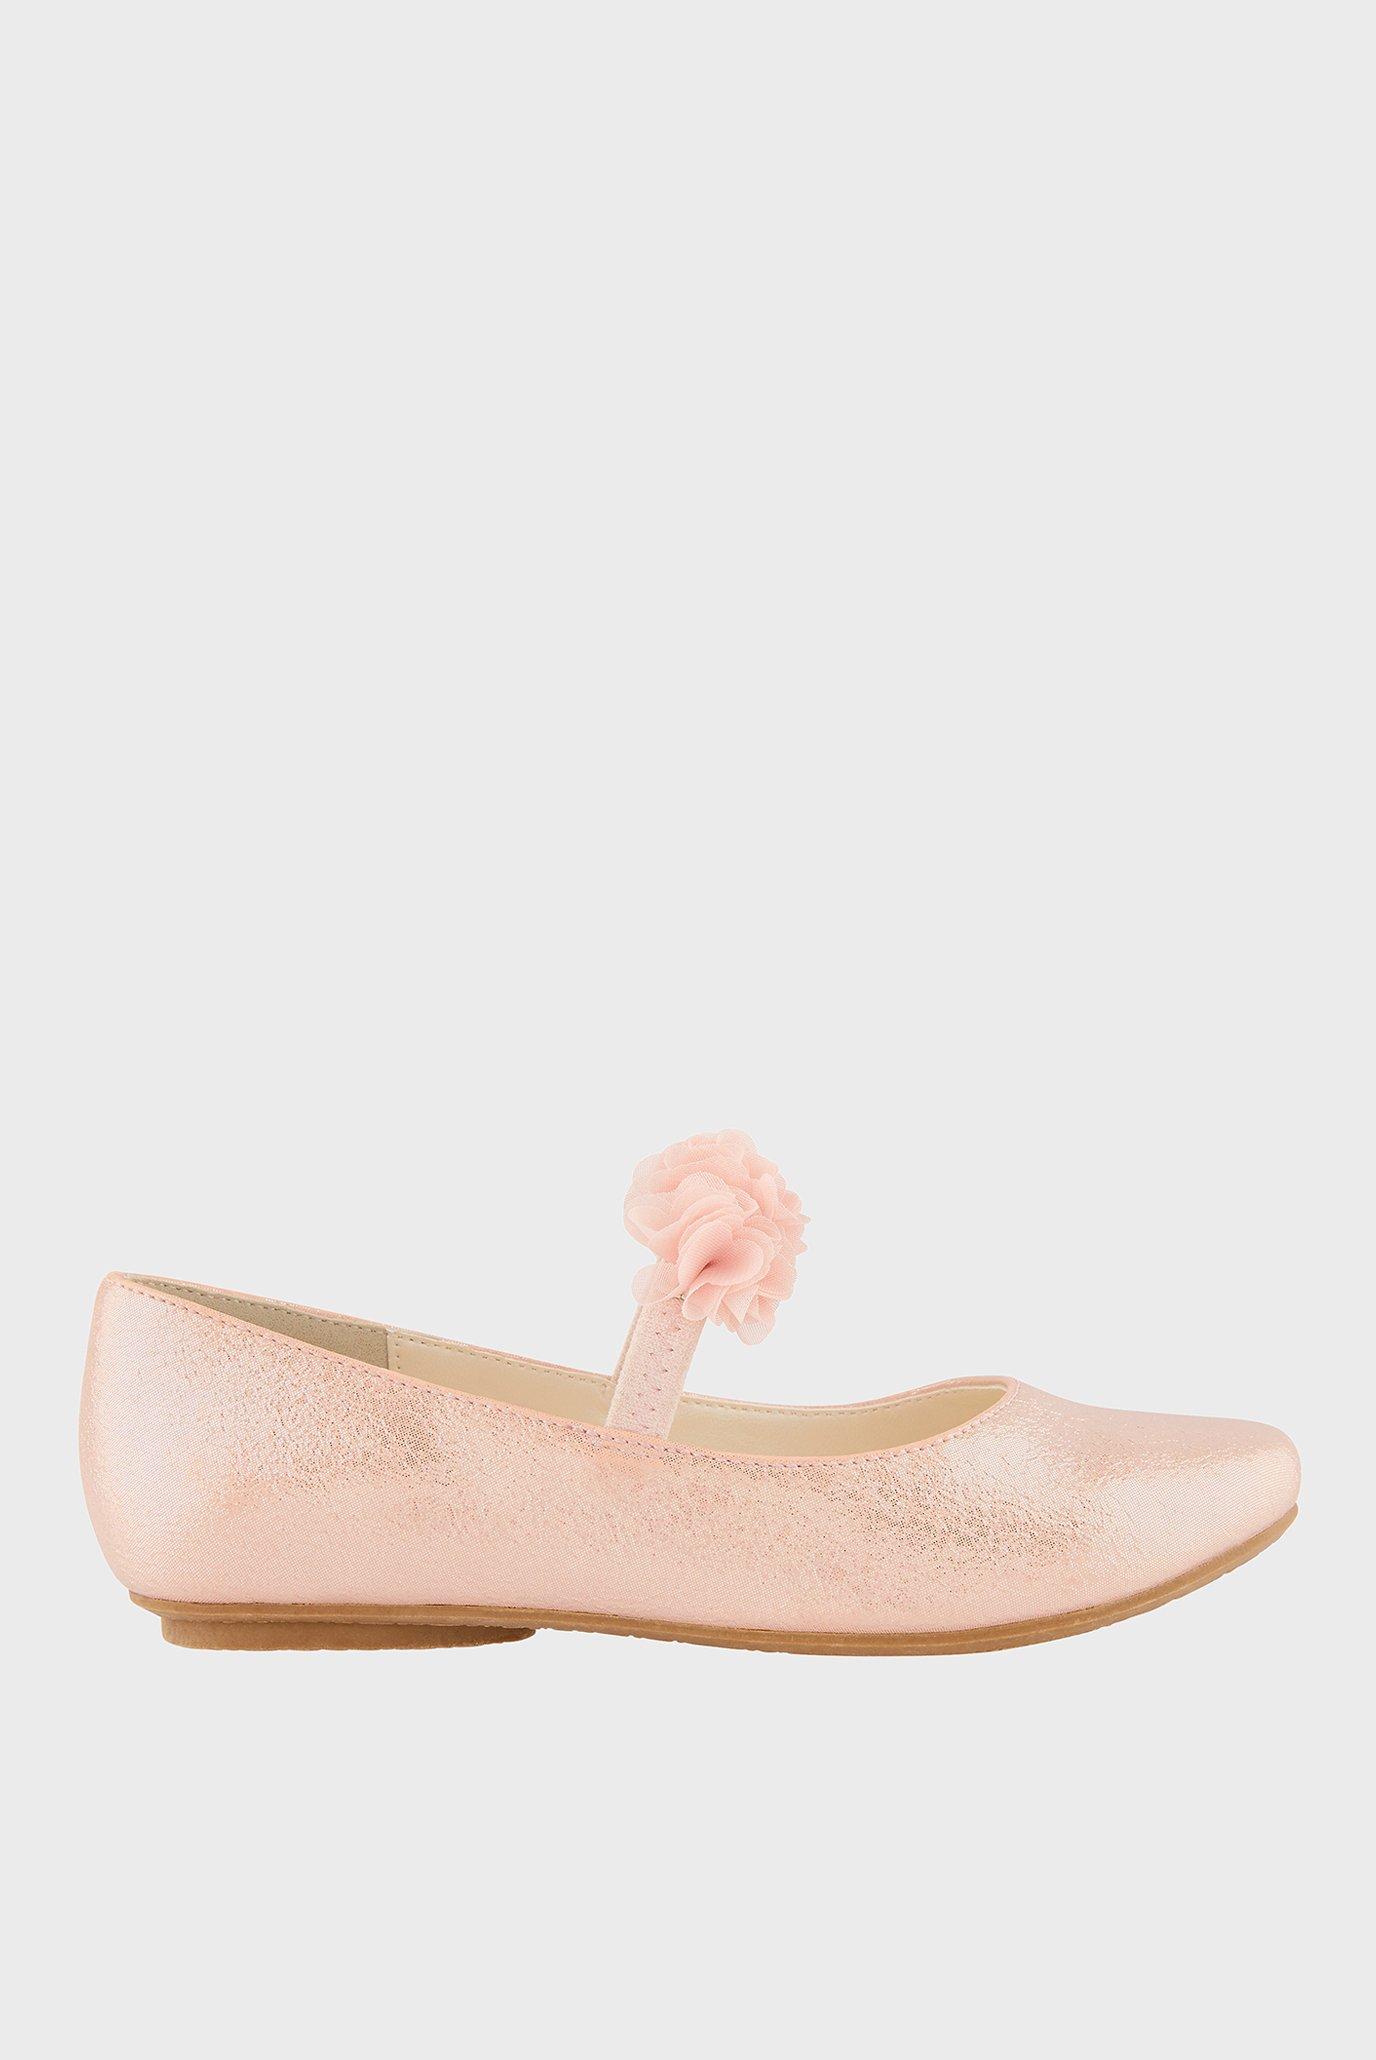 Детские розовые балетки PINK CYNTHIA CORSAGE 1